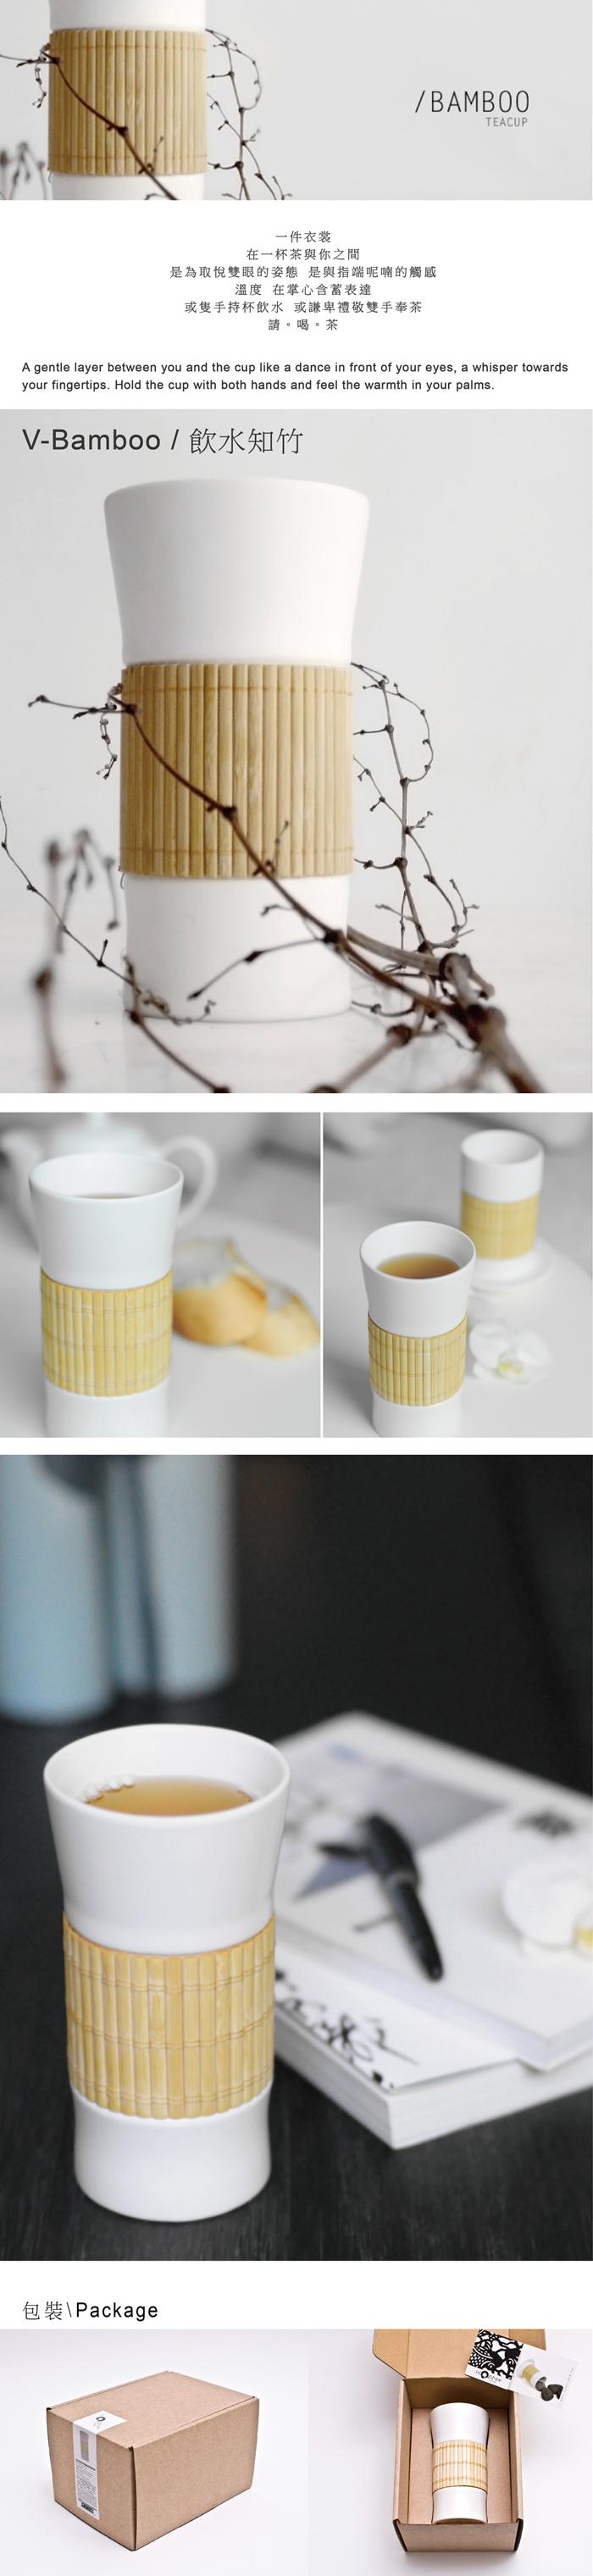 KOAN+ 飲水知竹 V-Bamboo